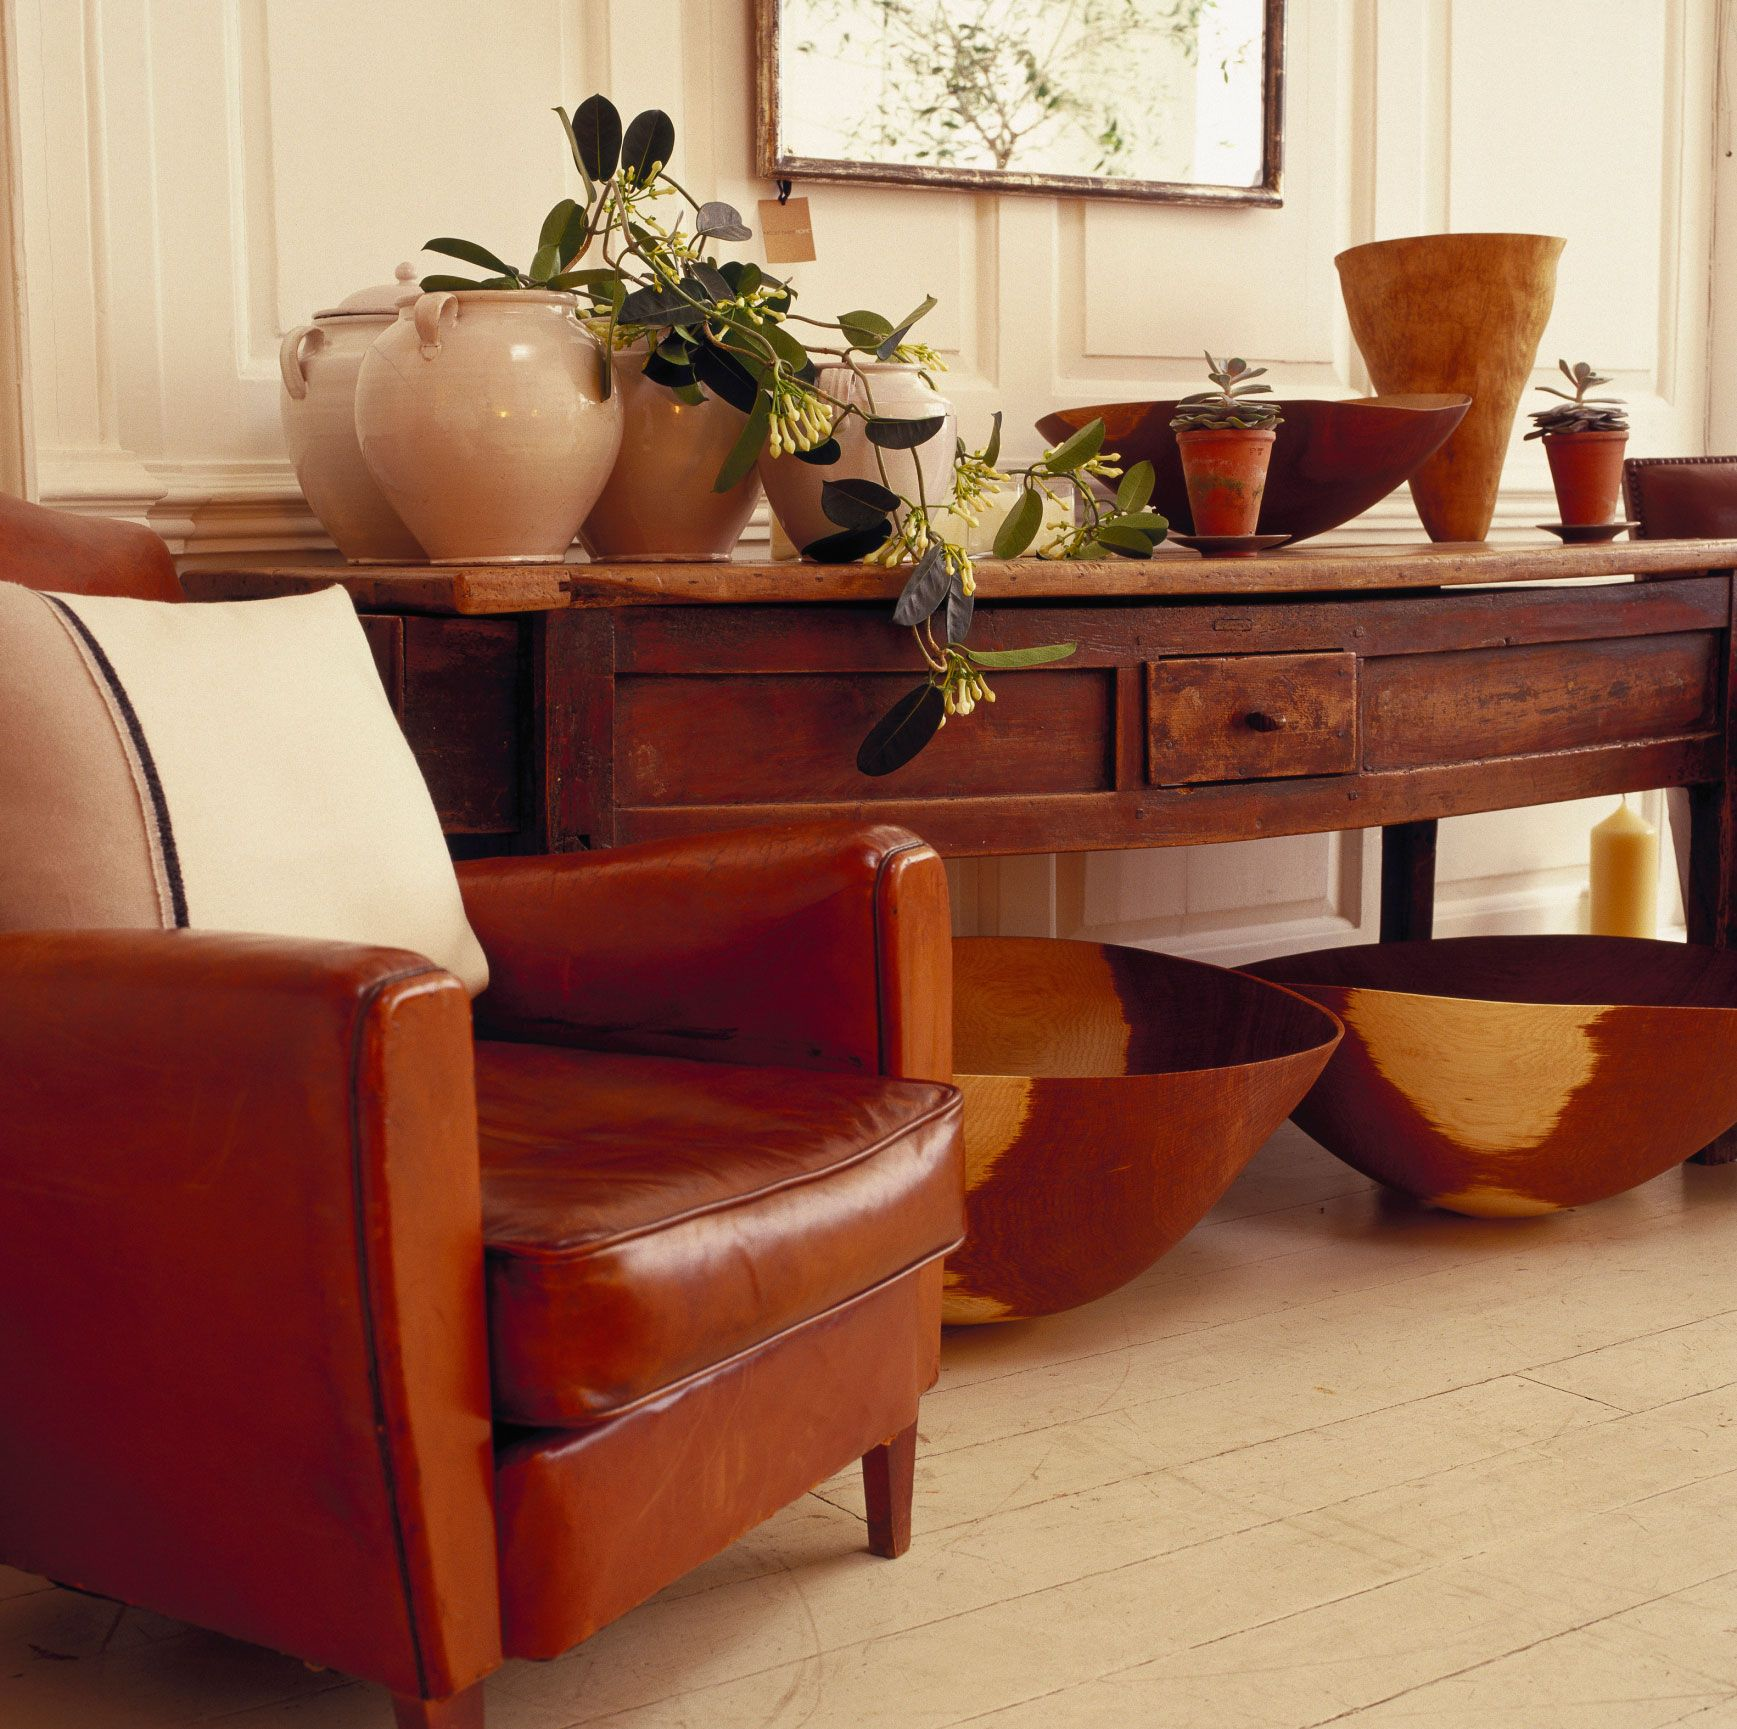 Muebles de estilo vintage hogarmania - Muebles de salon estilo vintage ...